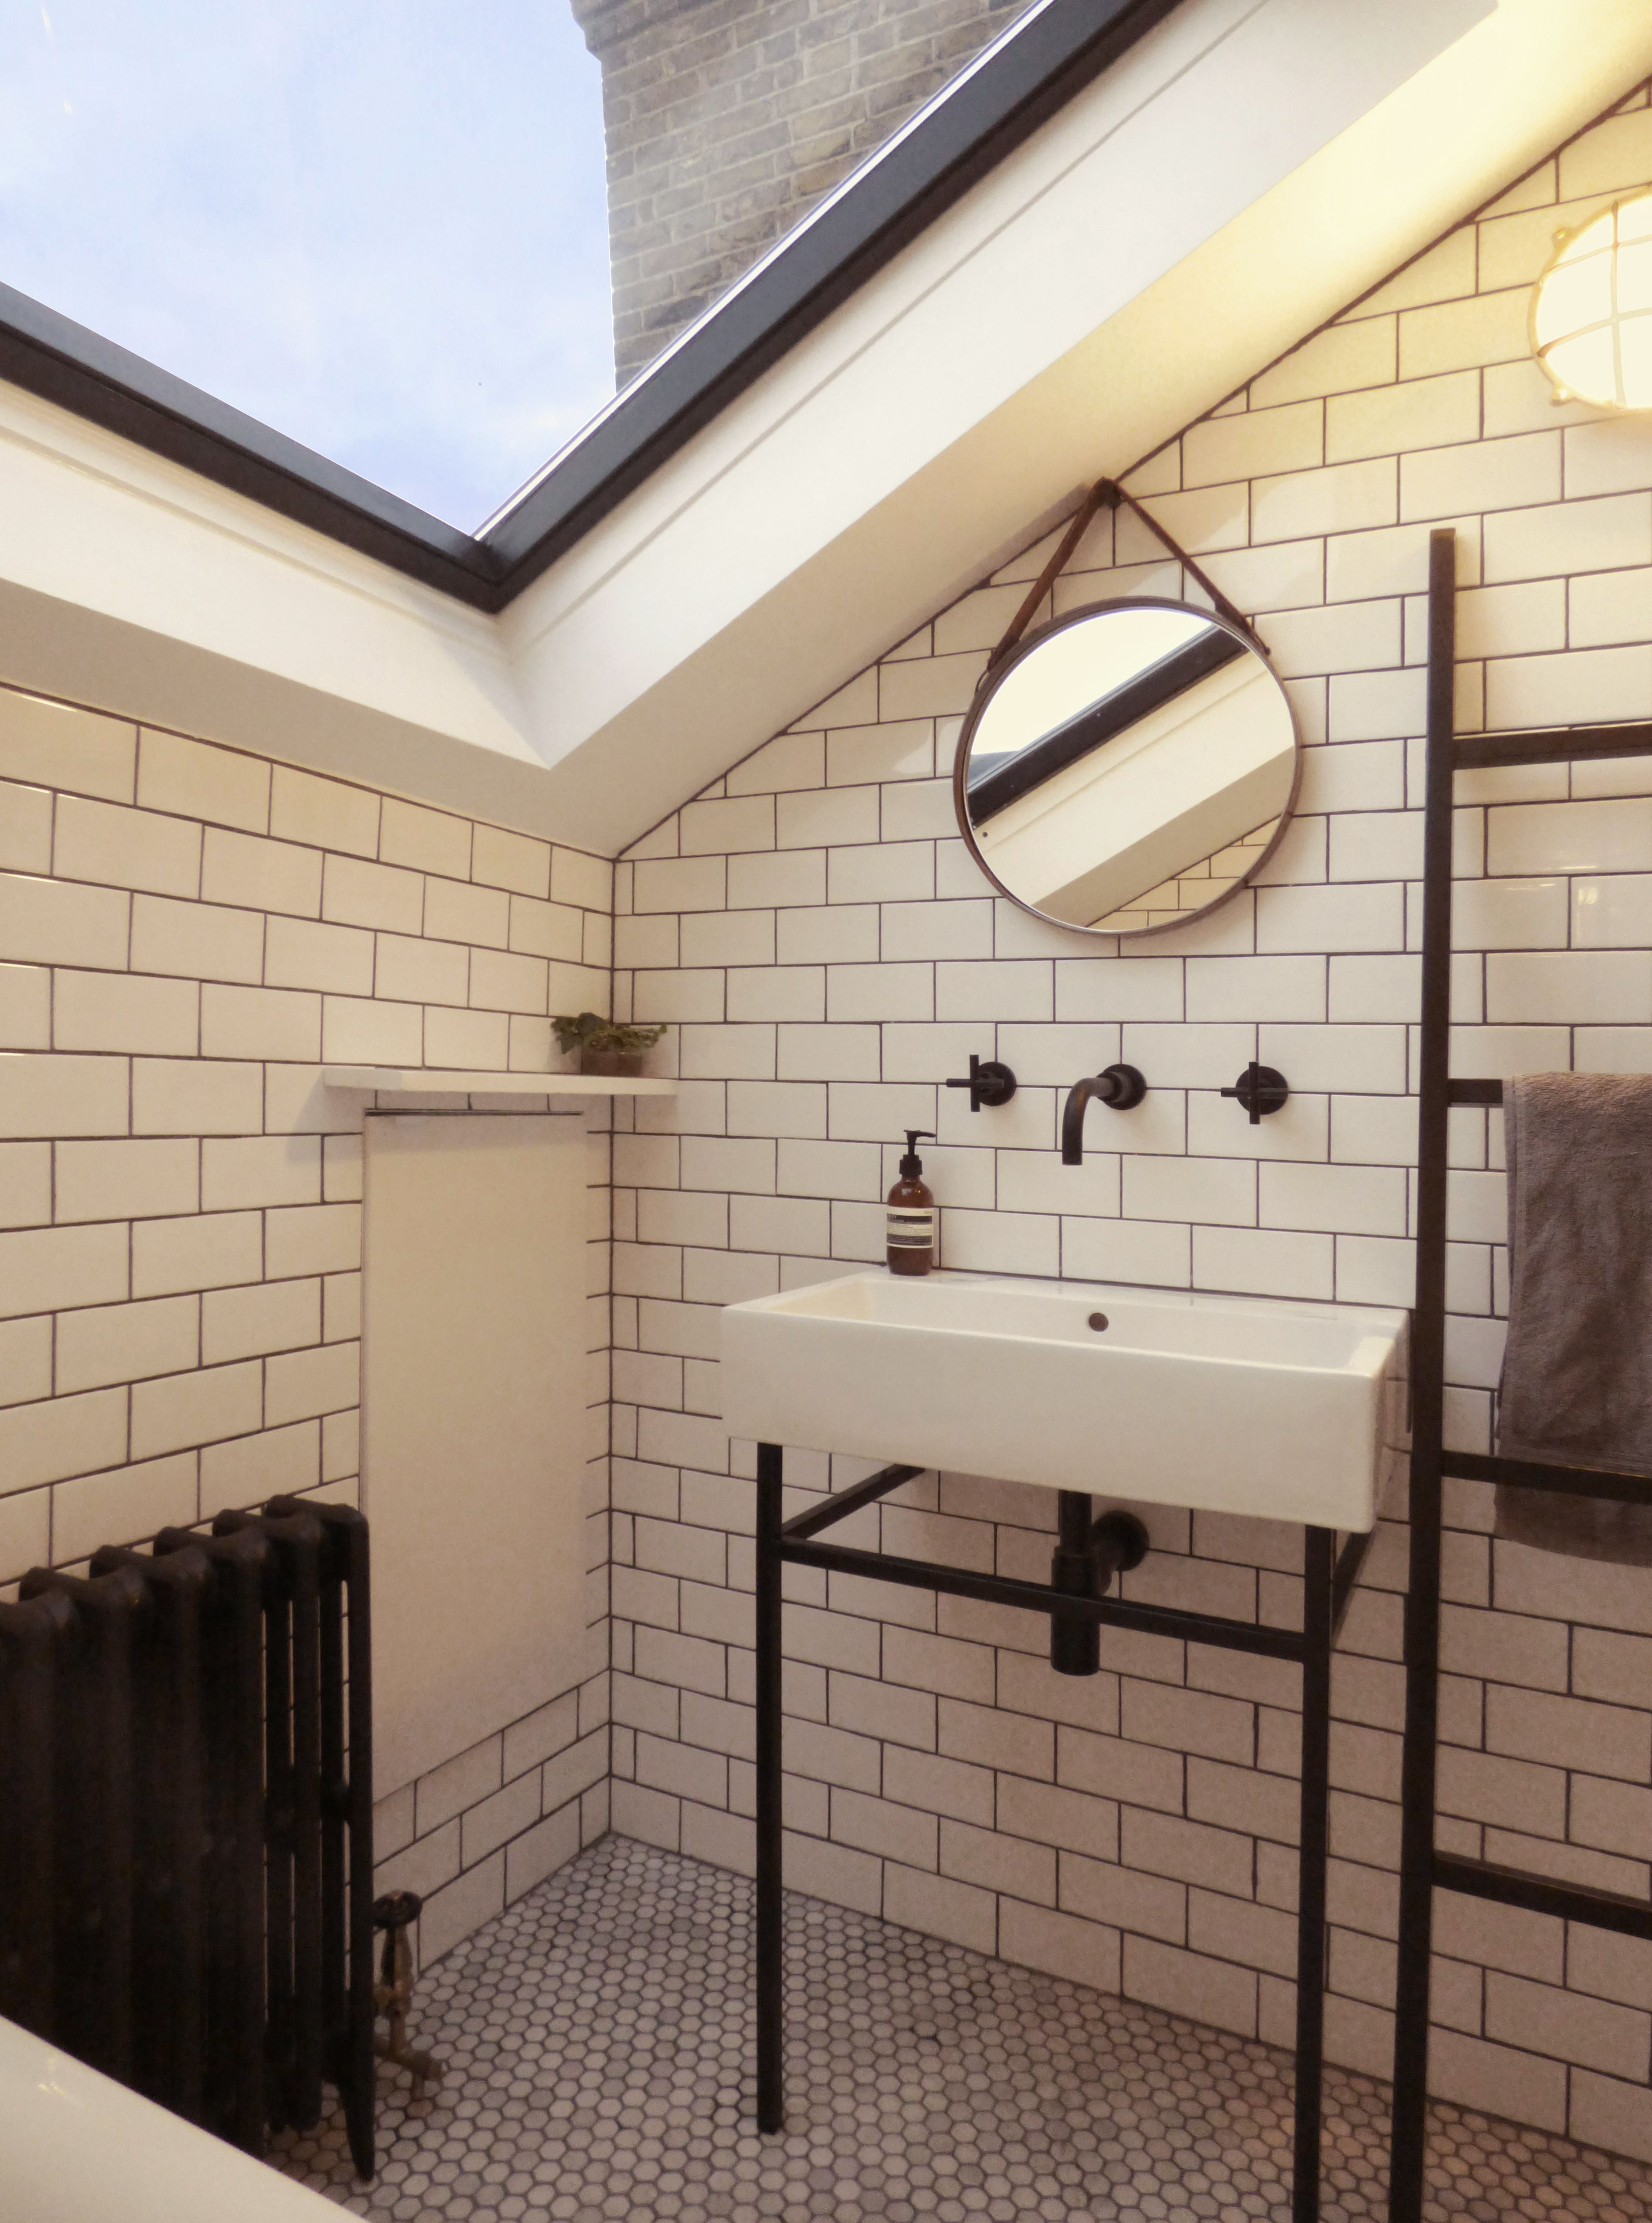 Bathroom mirror ideas diy for a small bathroom metro tiles